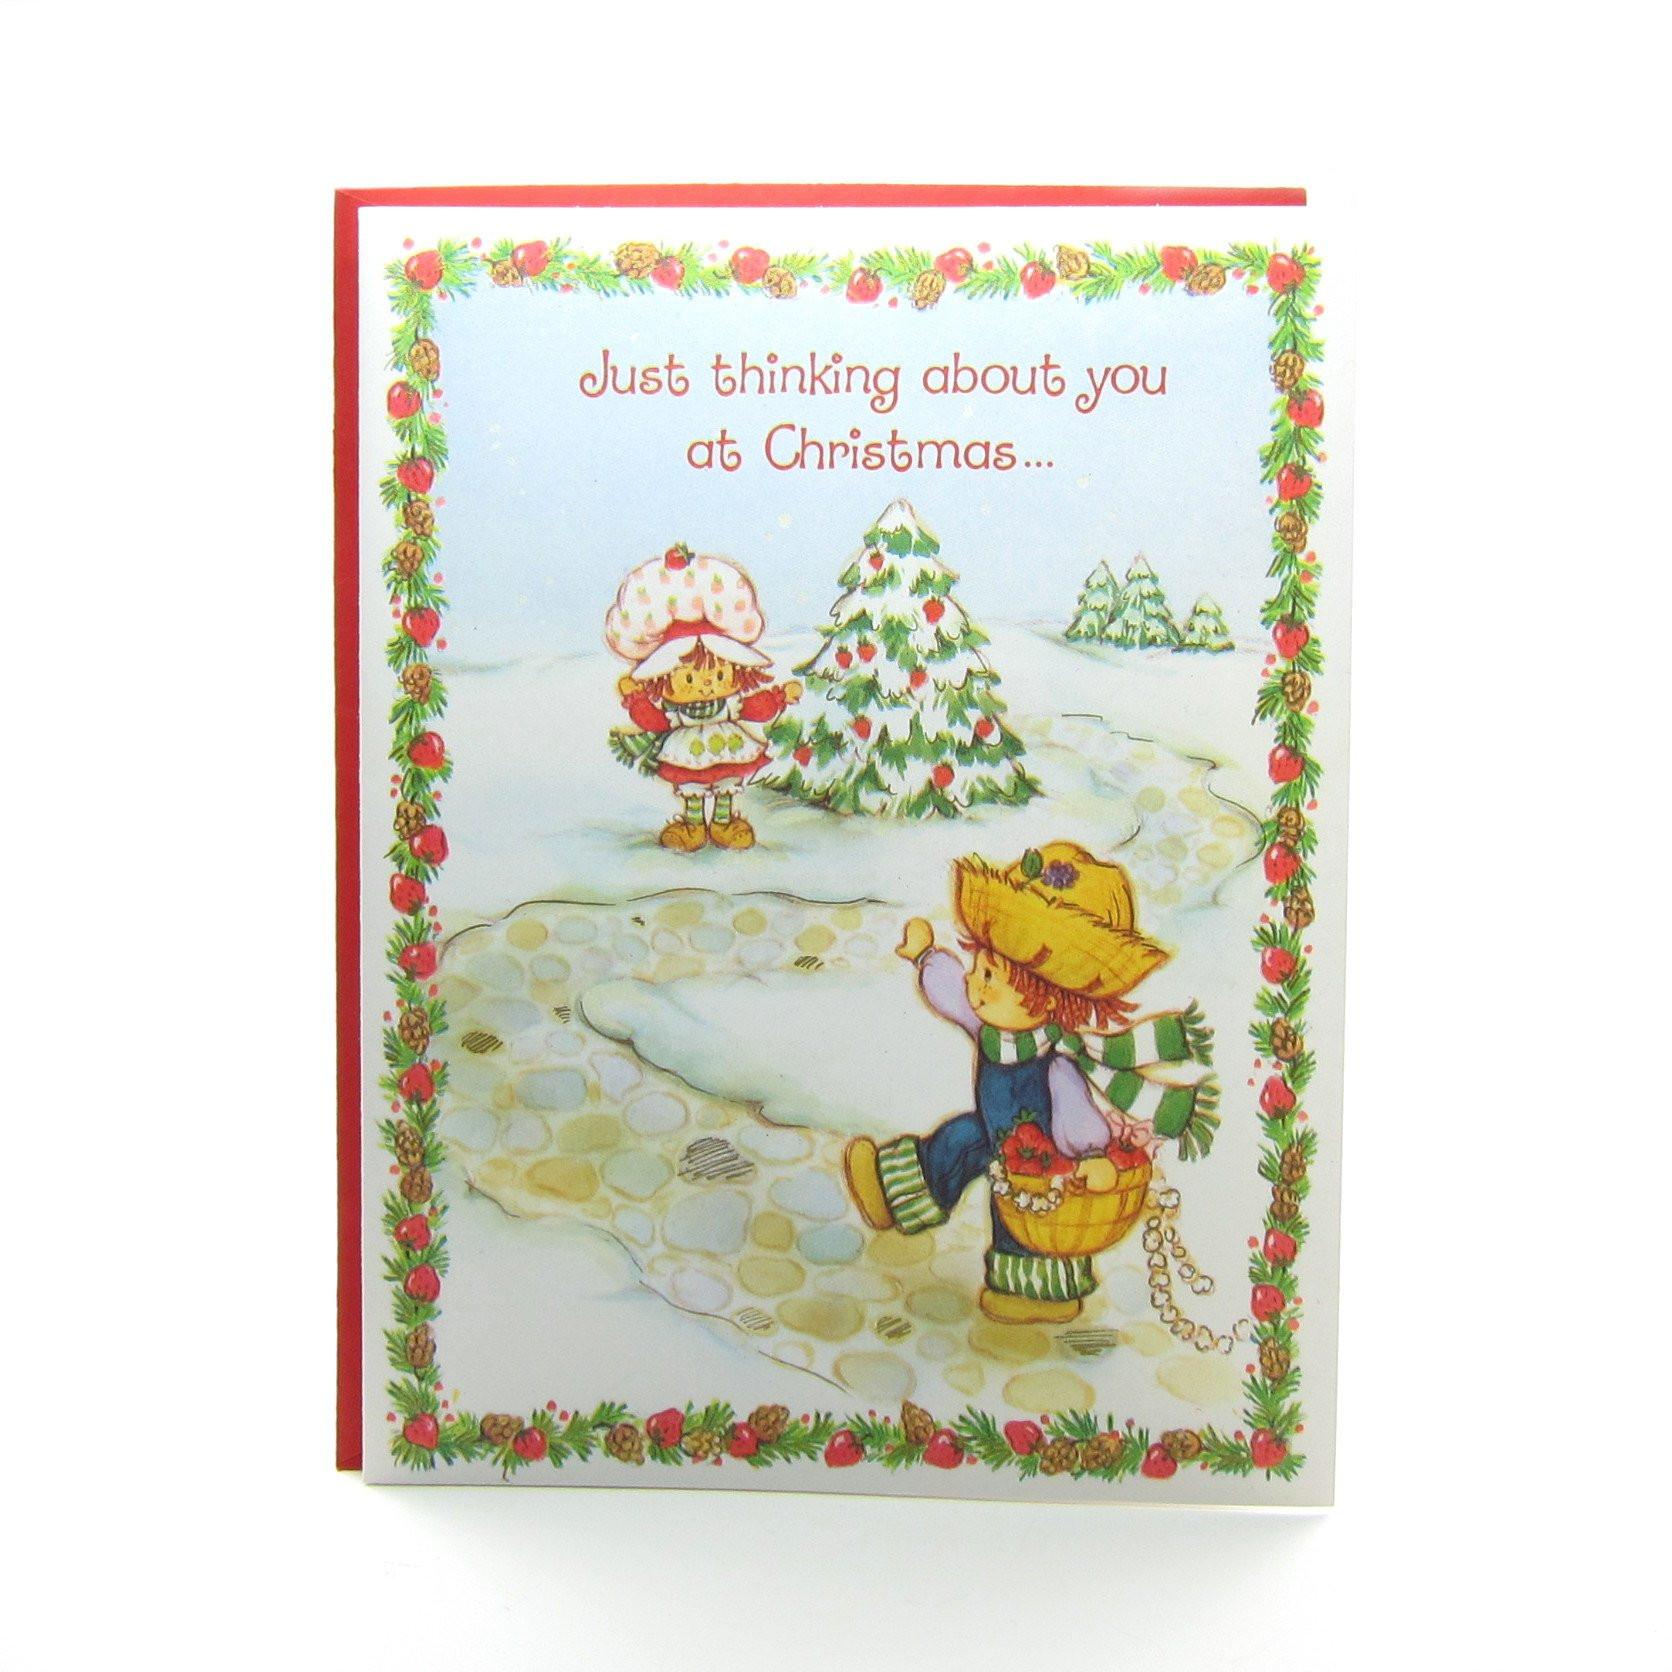 Strawberry Shortcake Christmas  Strawberry Shortcake Christmas Greeting Card with